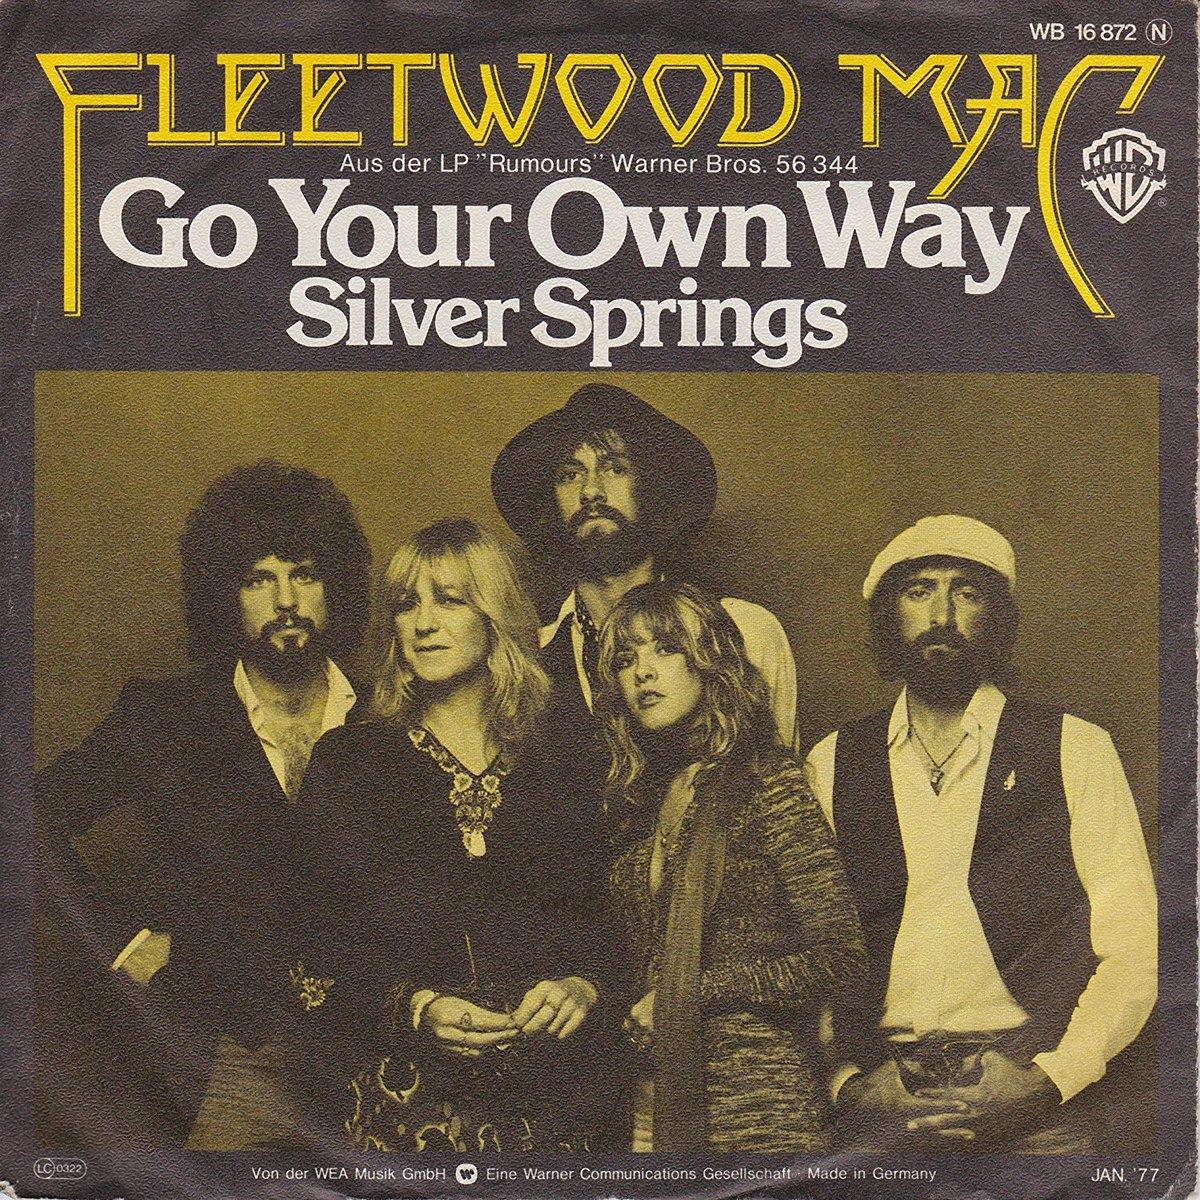 the dance fleetwood mac go your own way